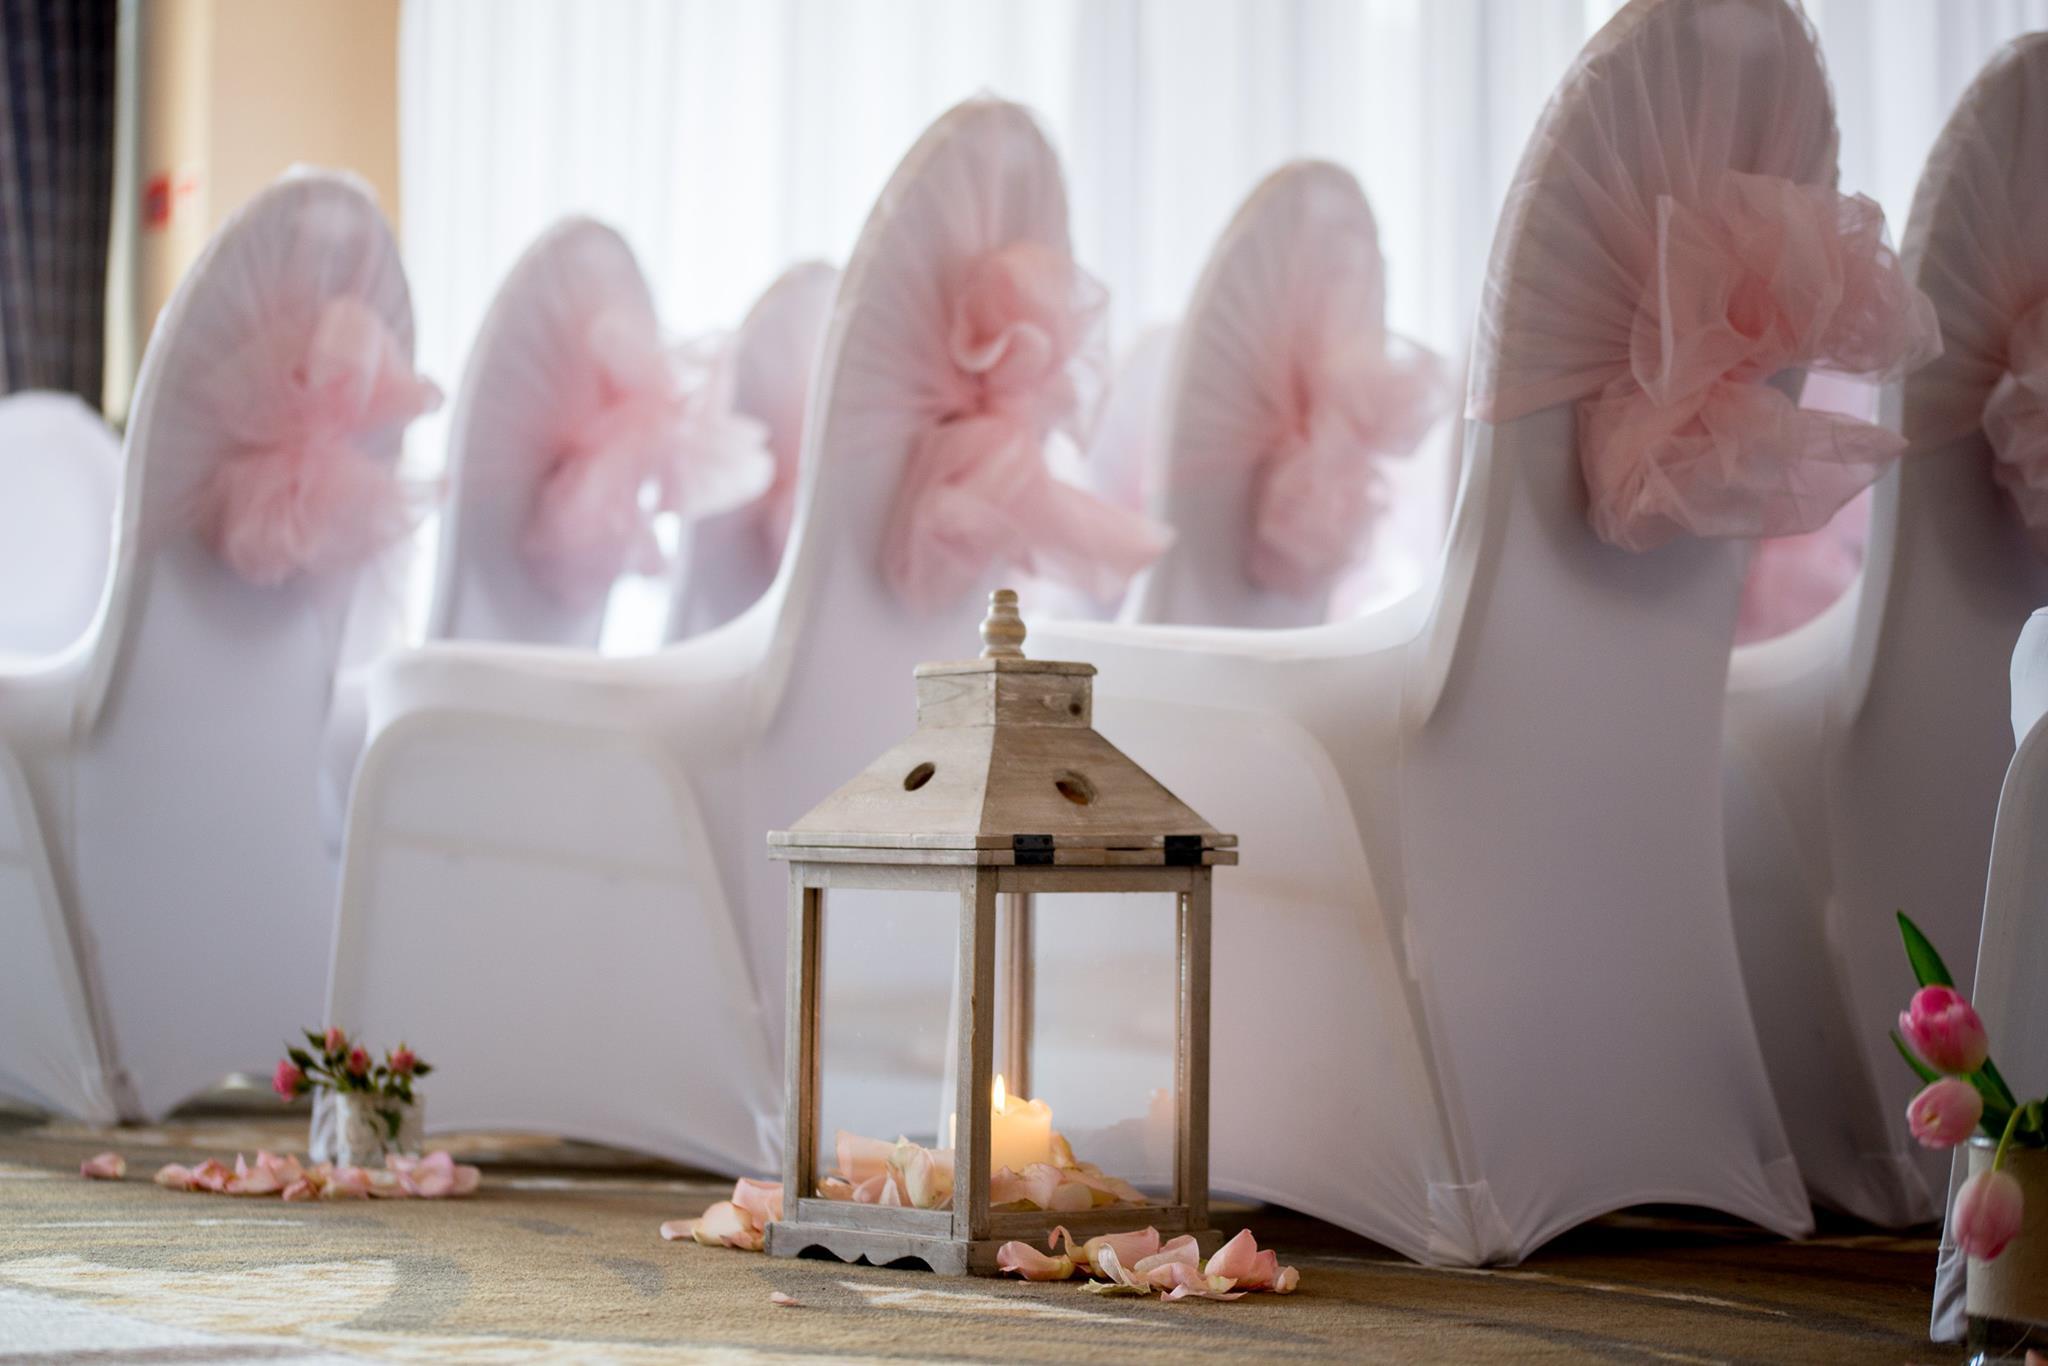 The Wedding Rooms Formby 4 Wedding Directory www.redeventweddingfayres.com:wedding-directory-northwest:venuestyling.jpg